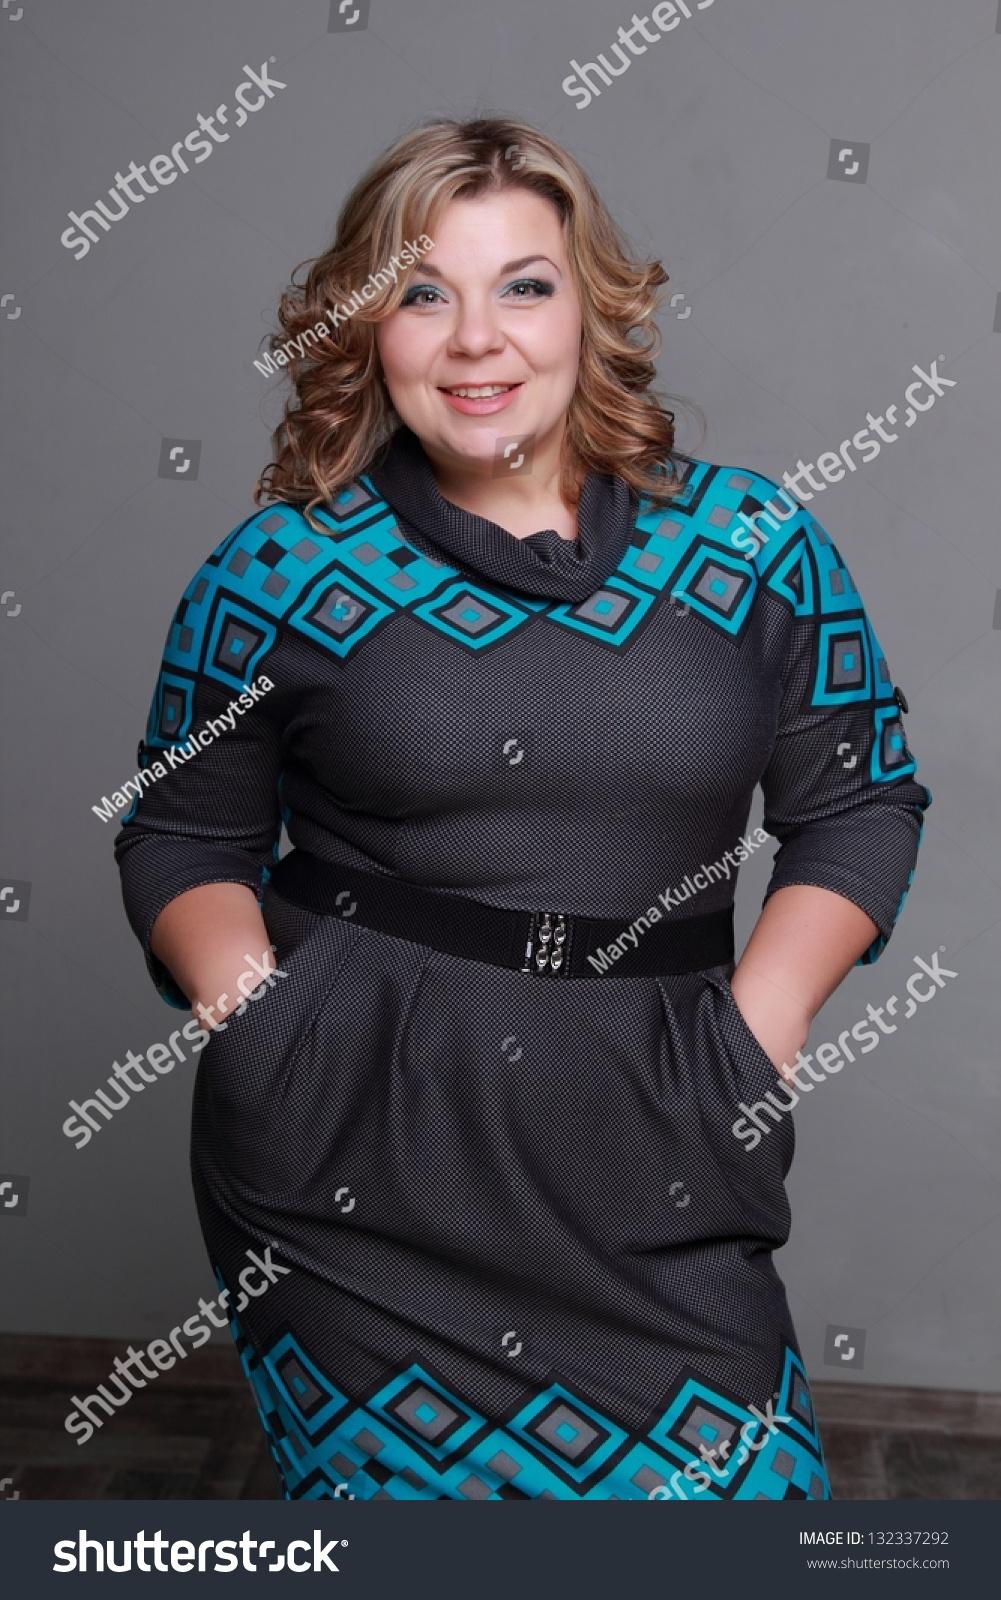 Fat Woman In A Beautiful Dress Stock Photo 132337292 : Shutterstock